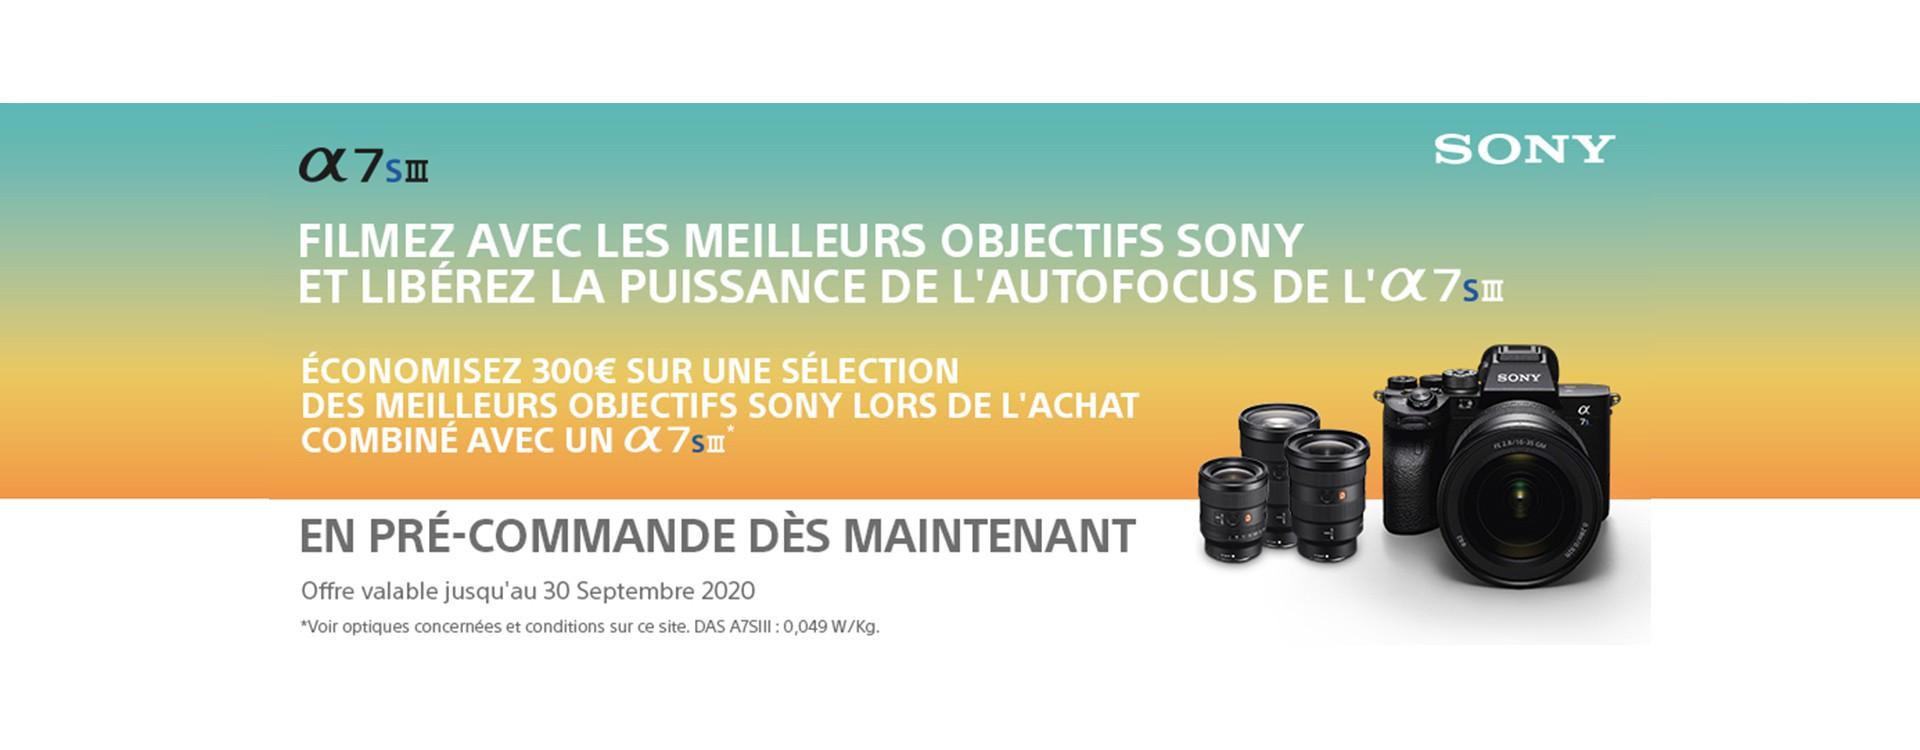 Offres de lancement Sony A7S III